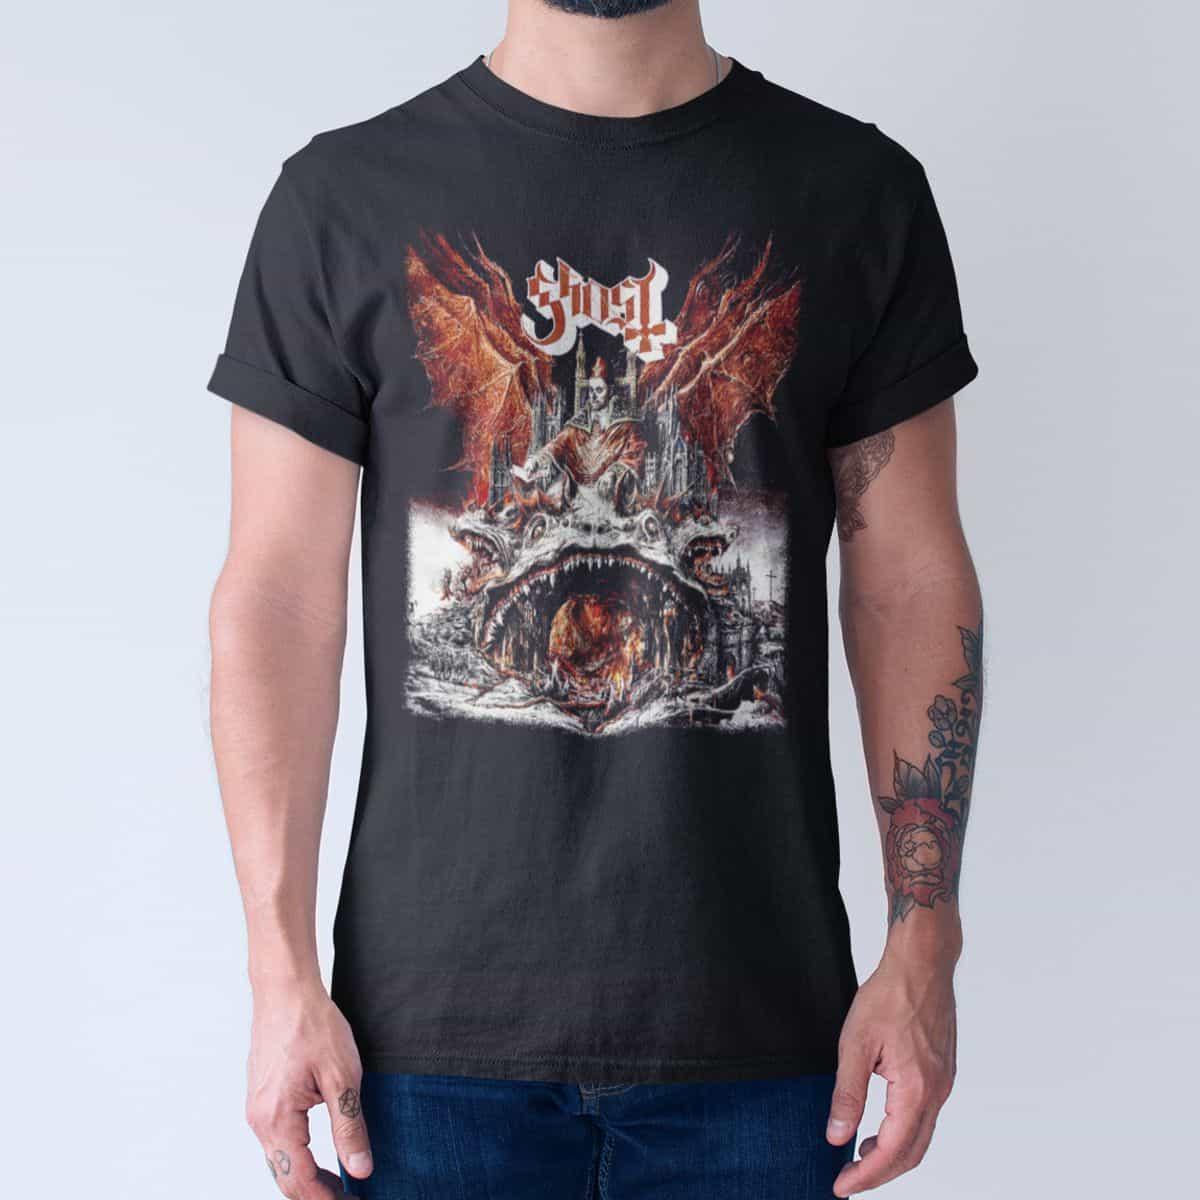 d182ba038245 Ghost Band T-Shirt, Ghost Prequelle Cover Tee-Shirt, Hard Rock, Heavy Metal  Merch – Metal Band T-Shirt   Metal Band Tee Shirts